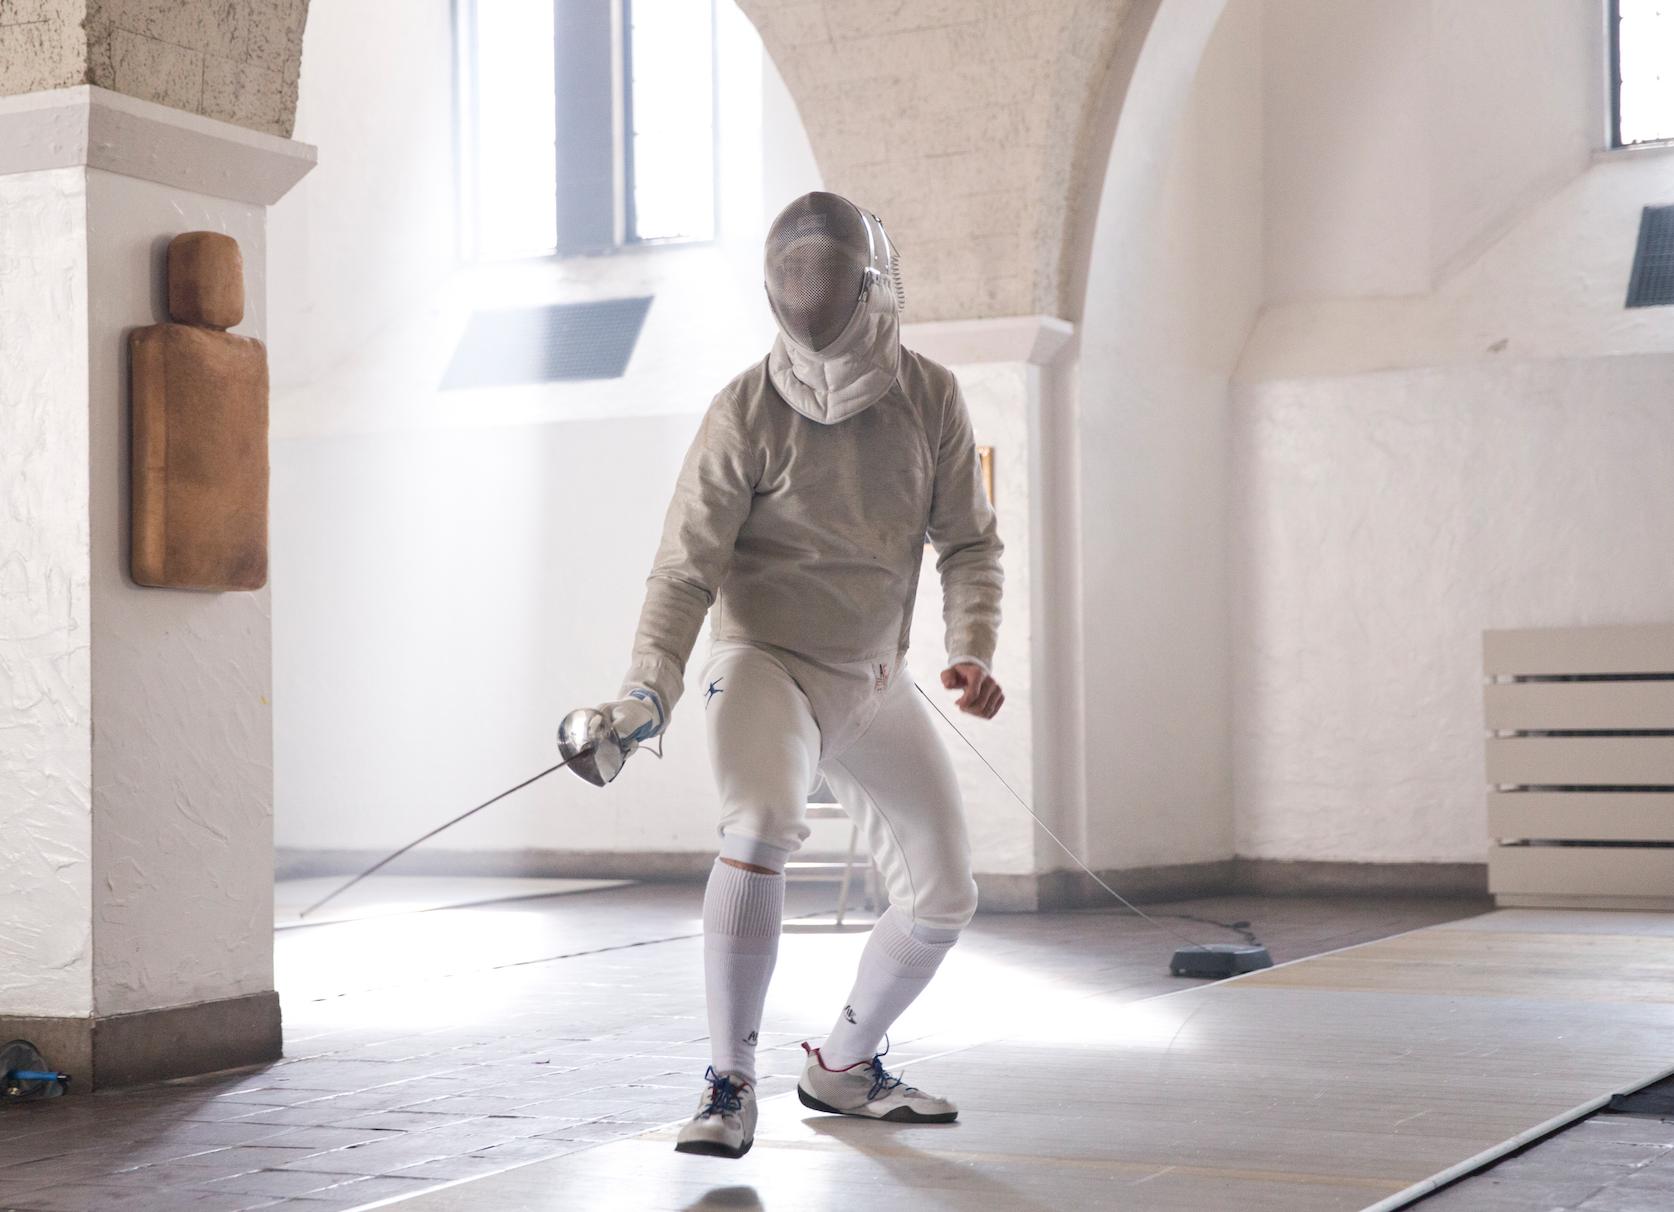 Fencing University 5 Essential Types of Footwork